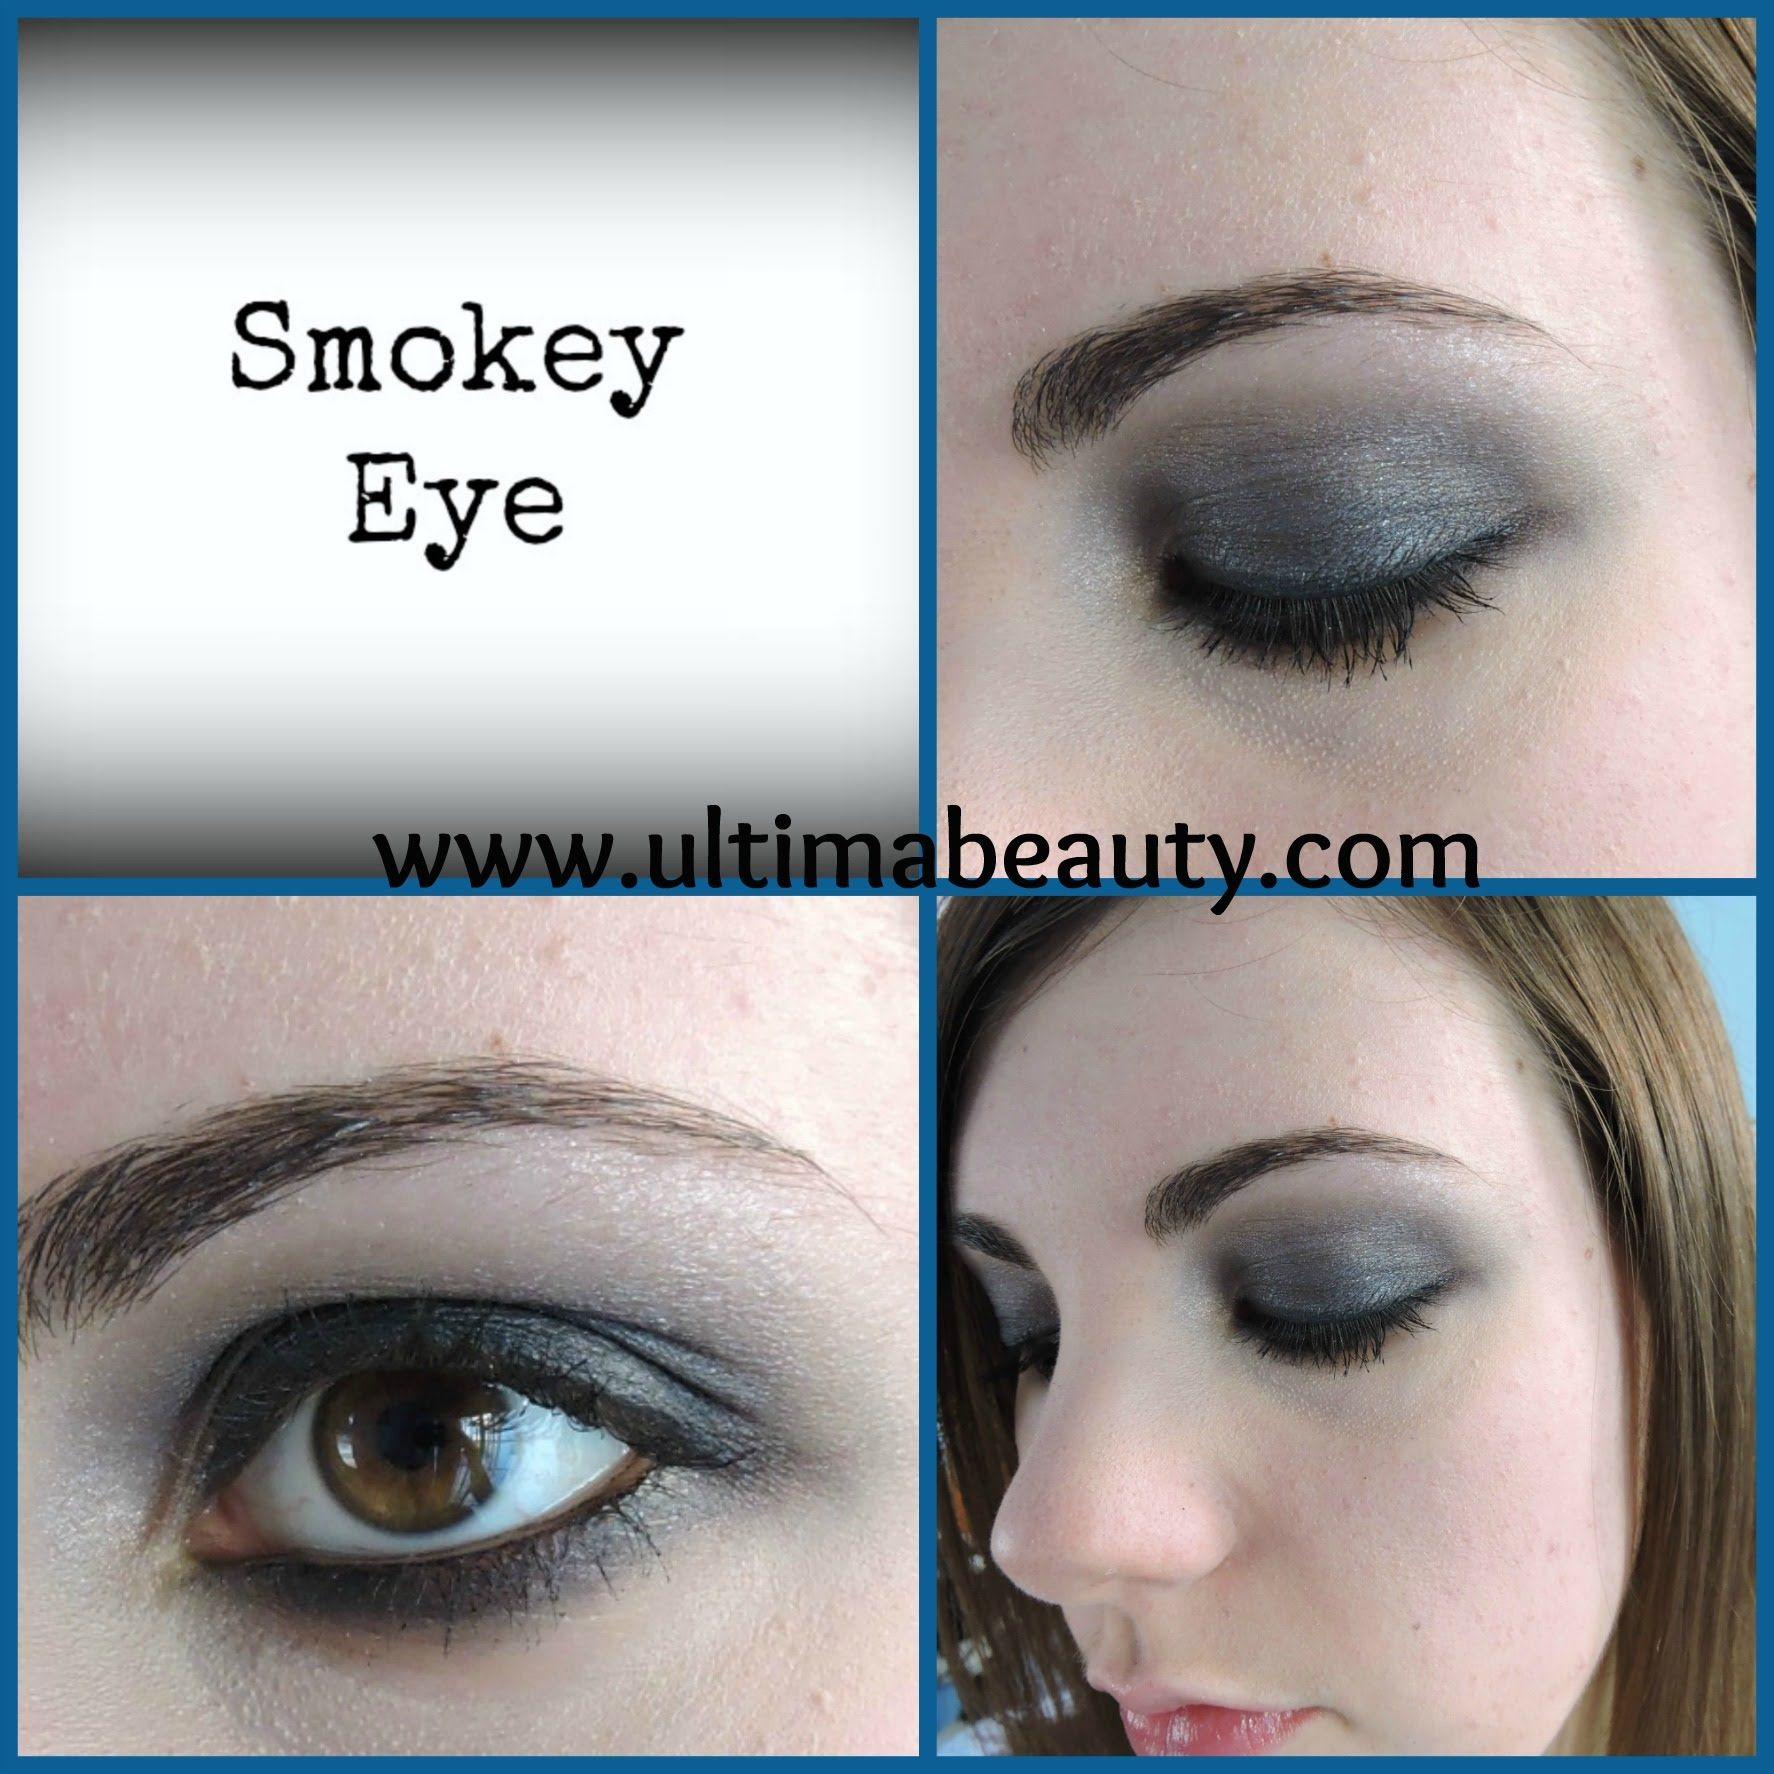 How To: Smokey Eye Tutorial #smokeyeye #makeuptutorial #makeup